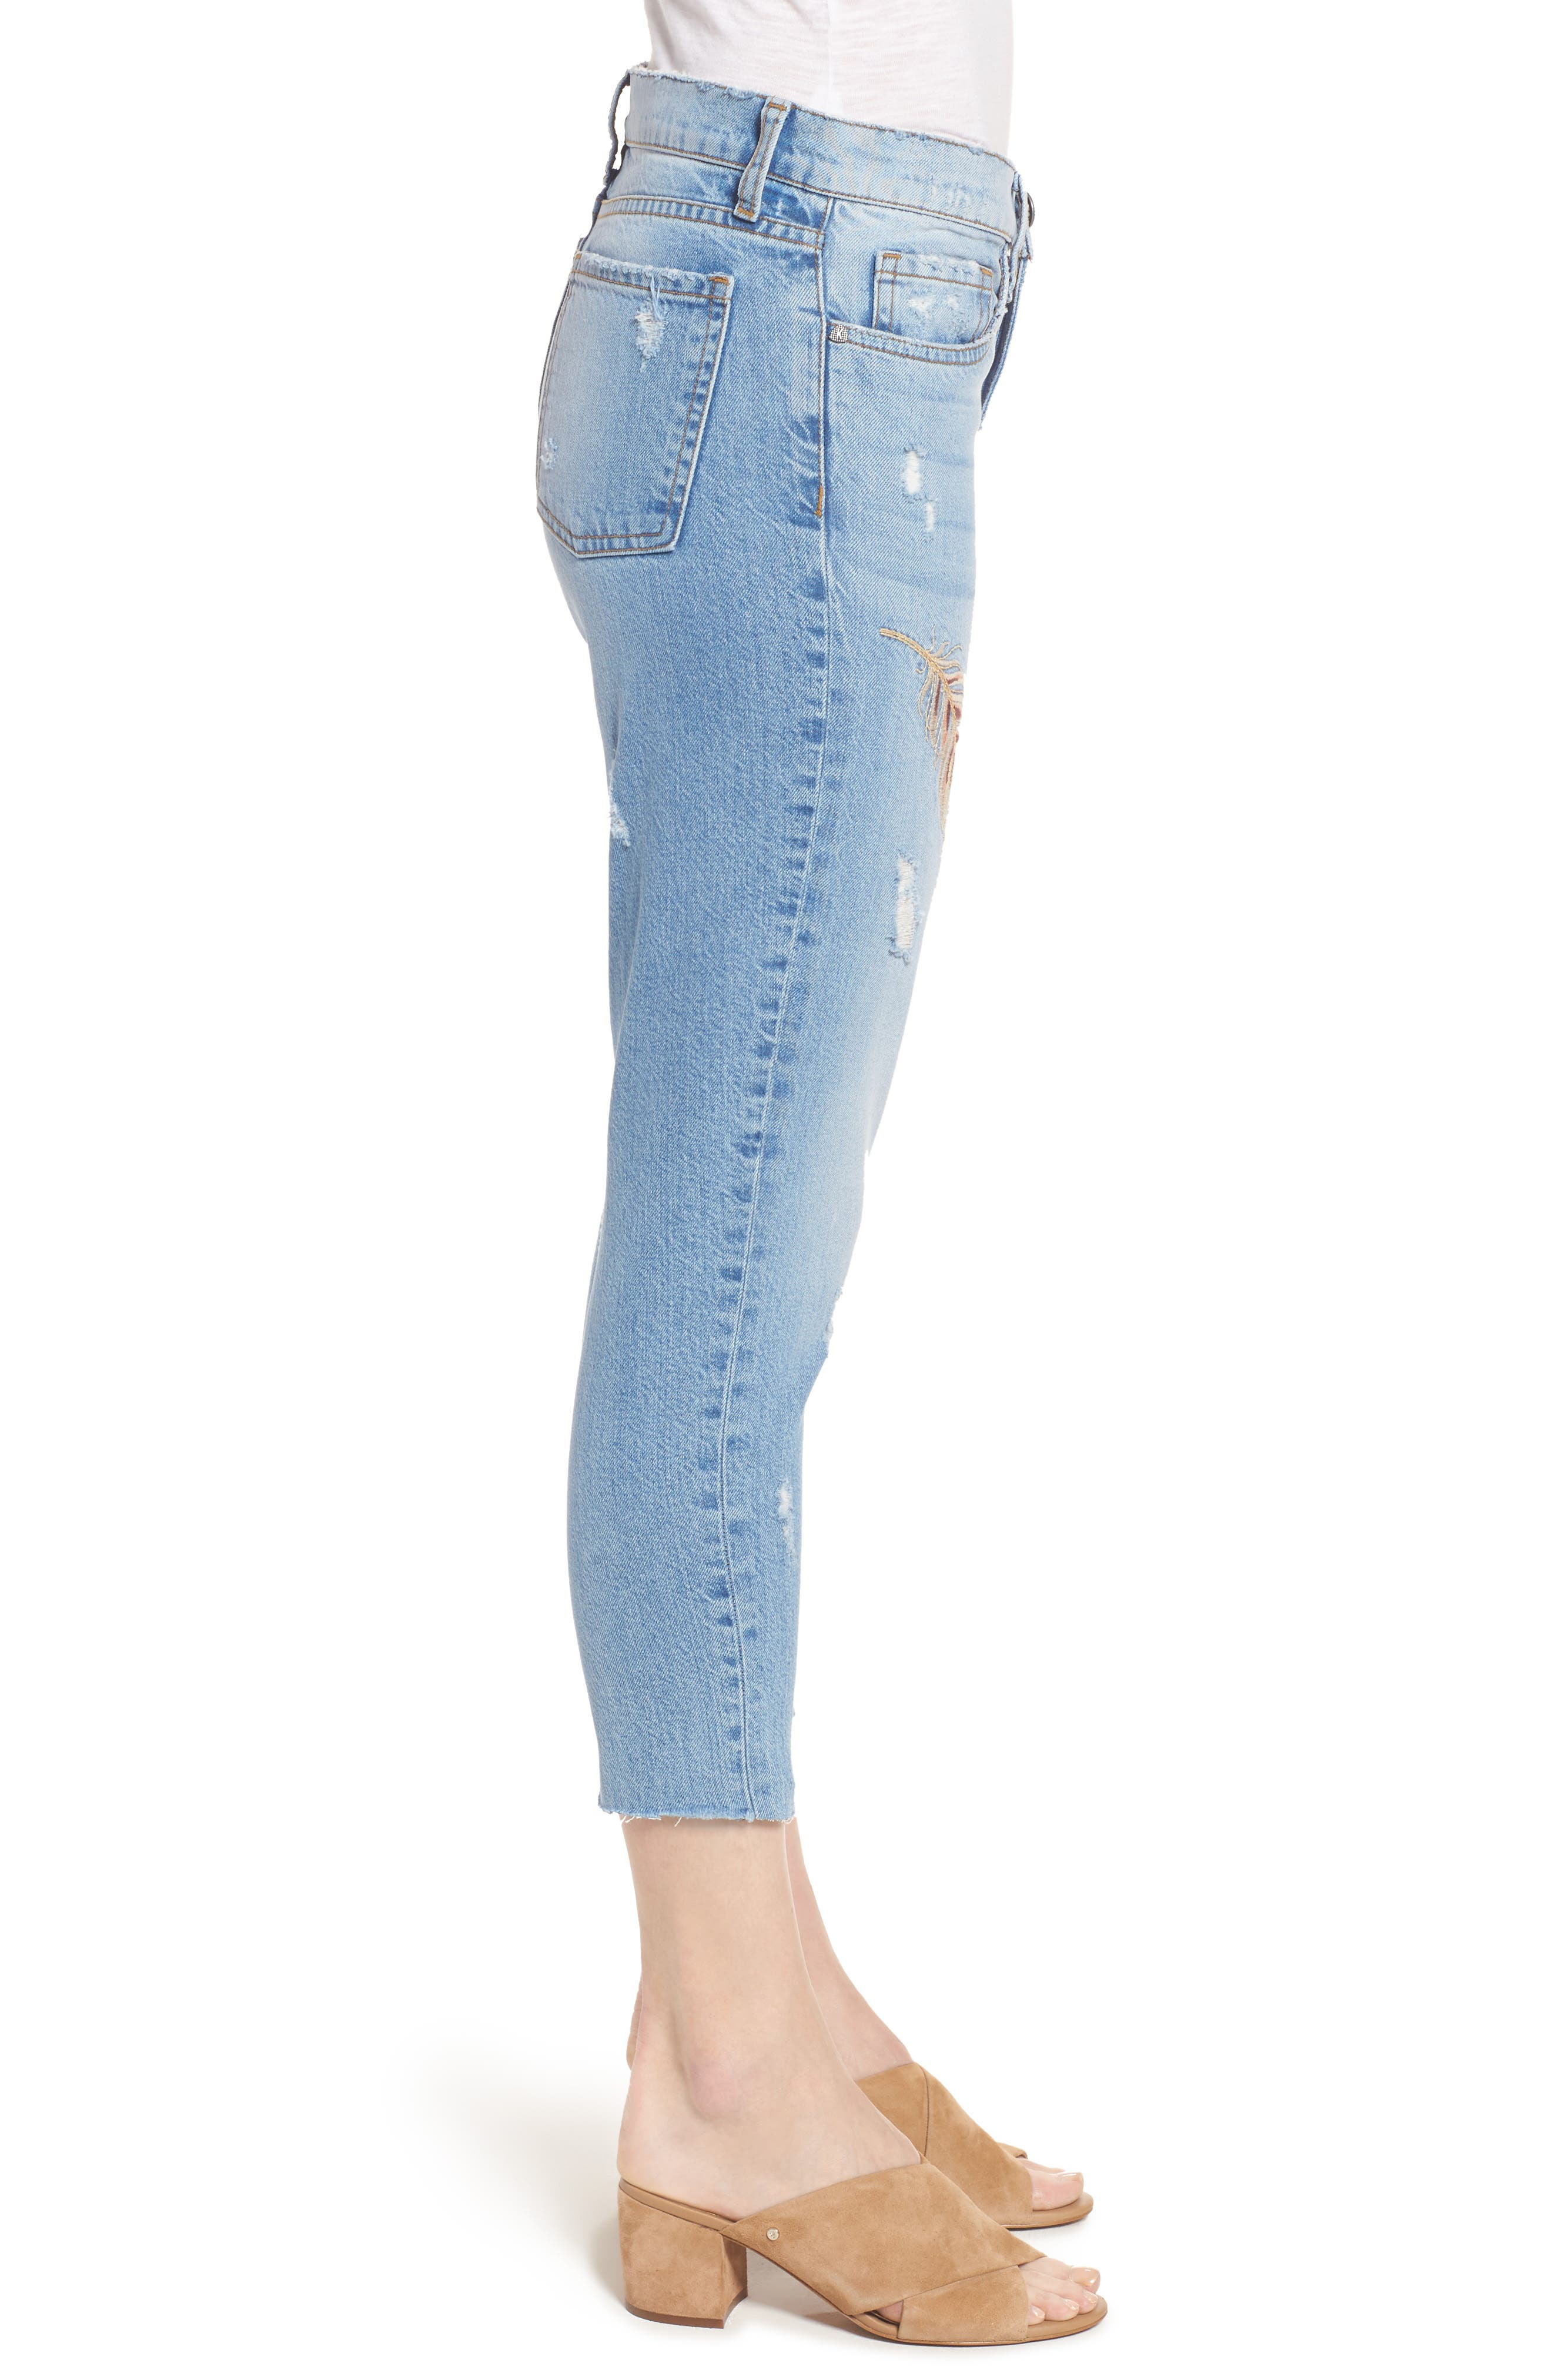 Alternate Image 3  - KUT from the Kloth Allie Crop Boyfriend Jeans (Kingly)